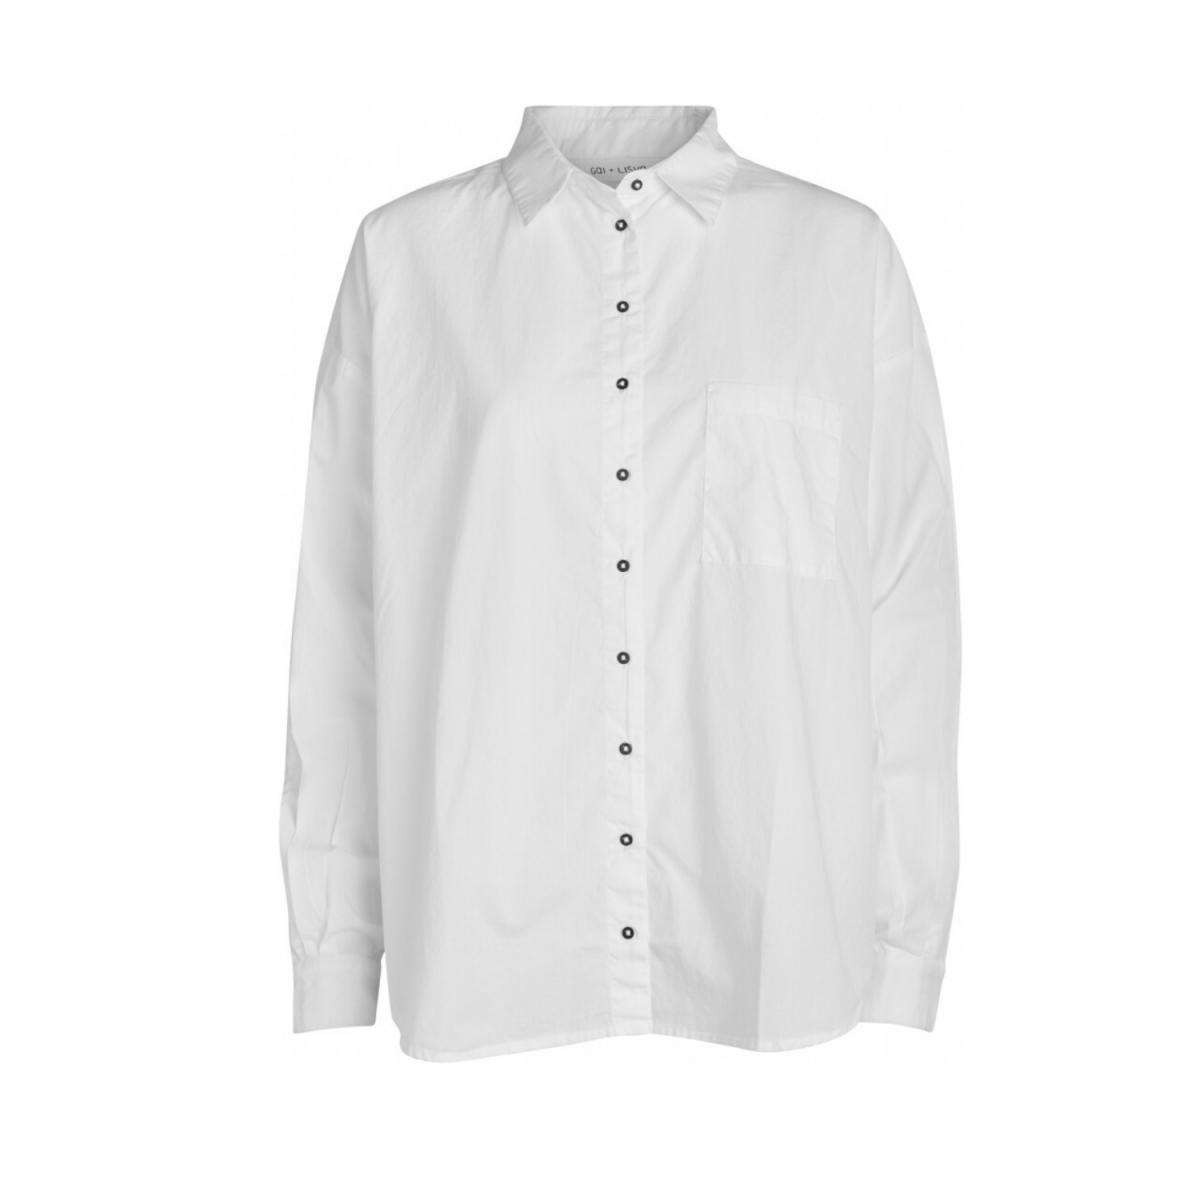 shanta shirt - white - front